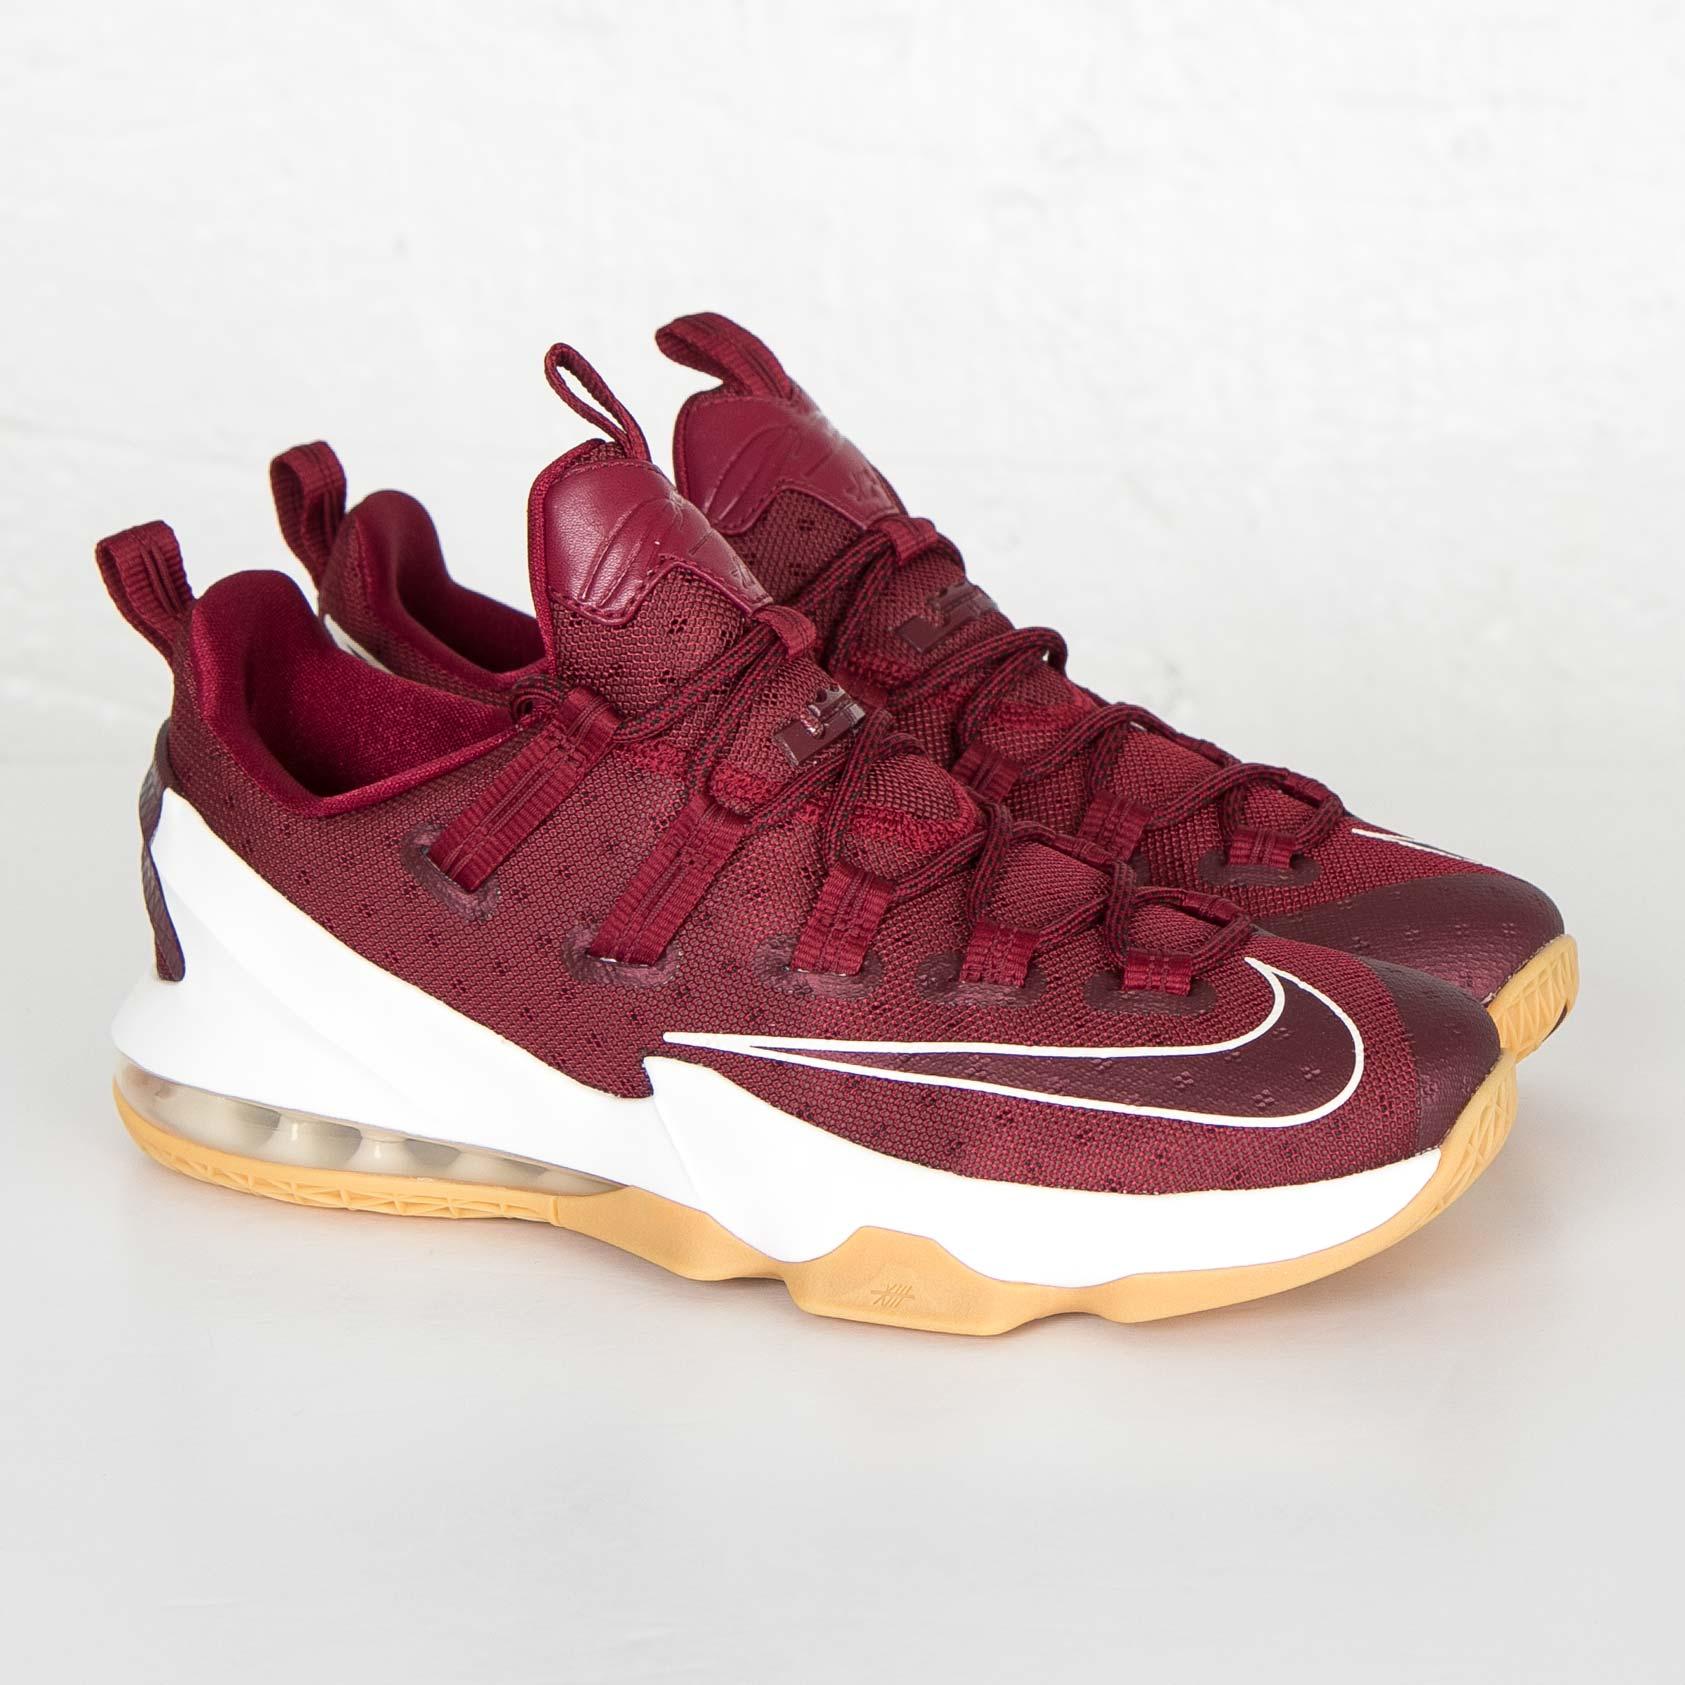 newest 6f39b f0255 Nike Lebron XIII Low